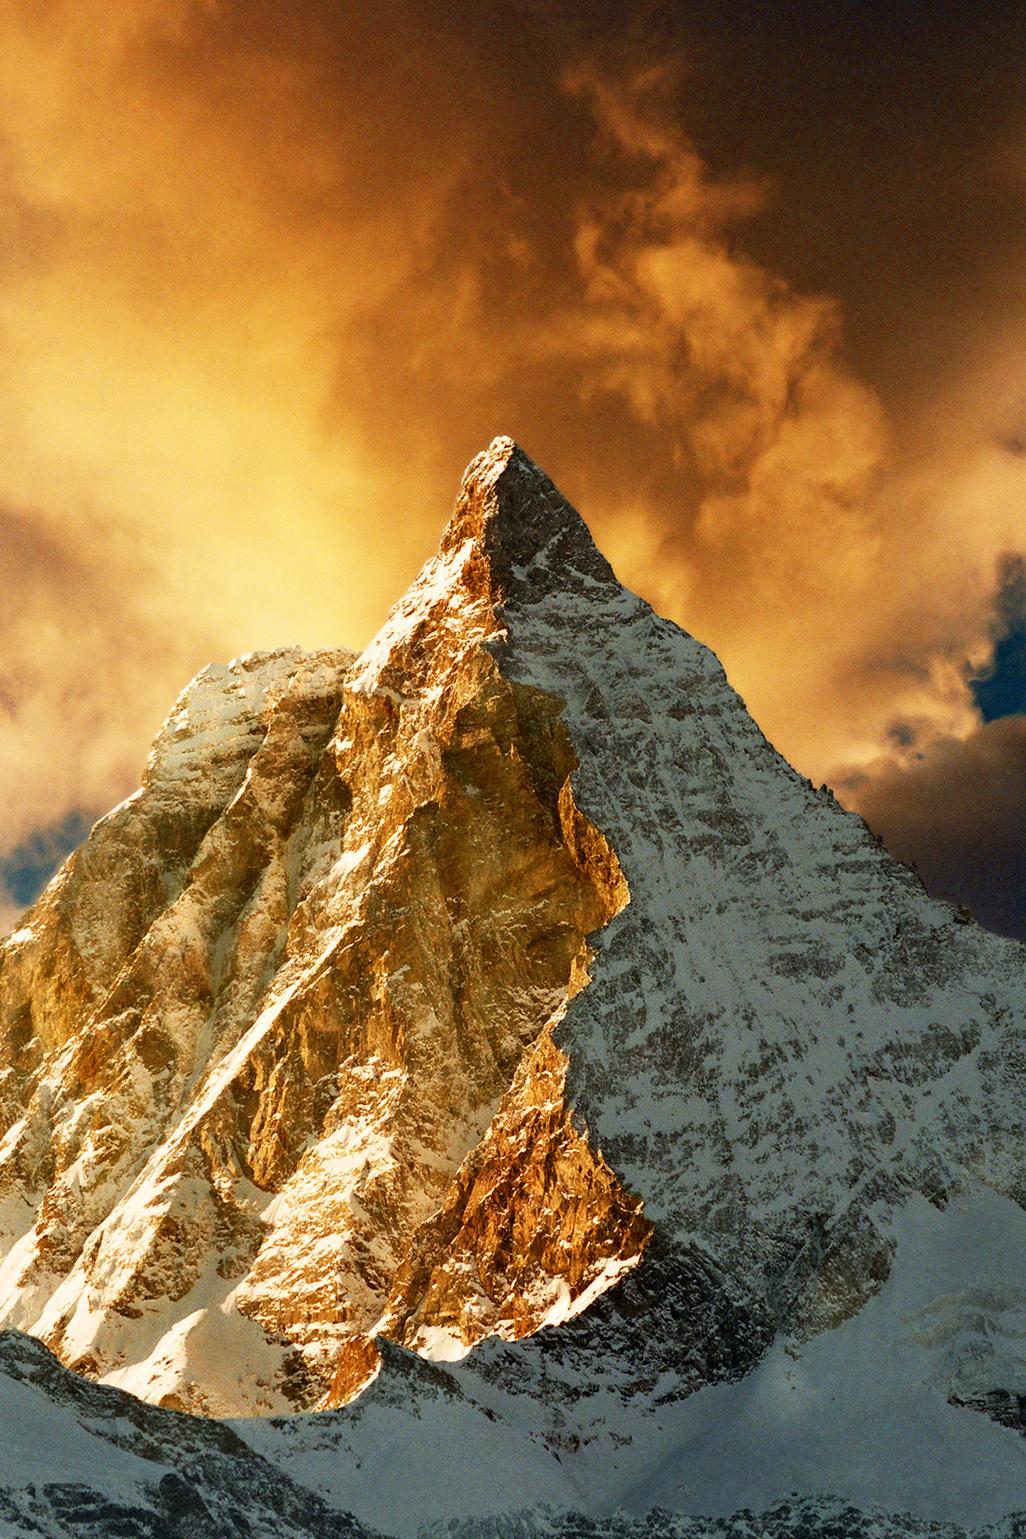 lsleofskye :       Golden peak